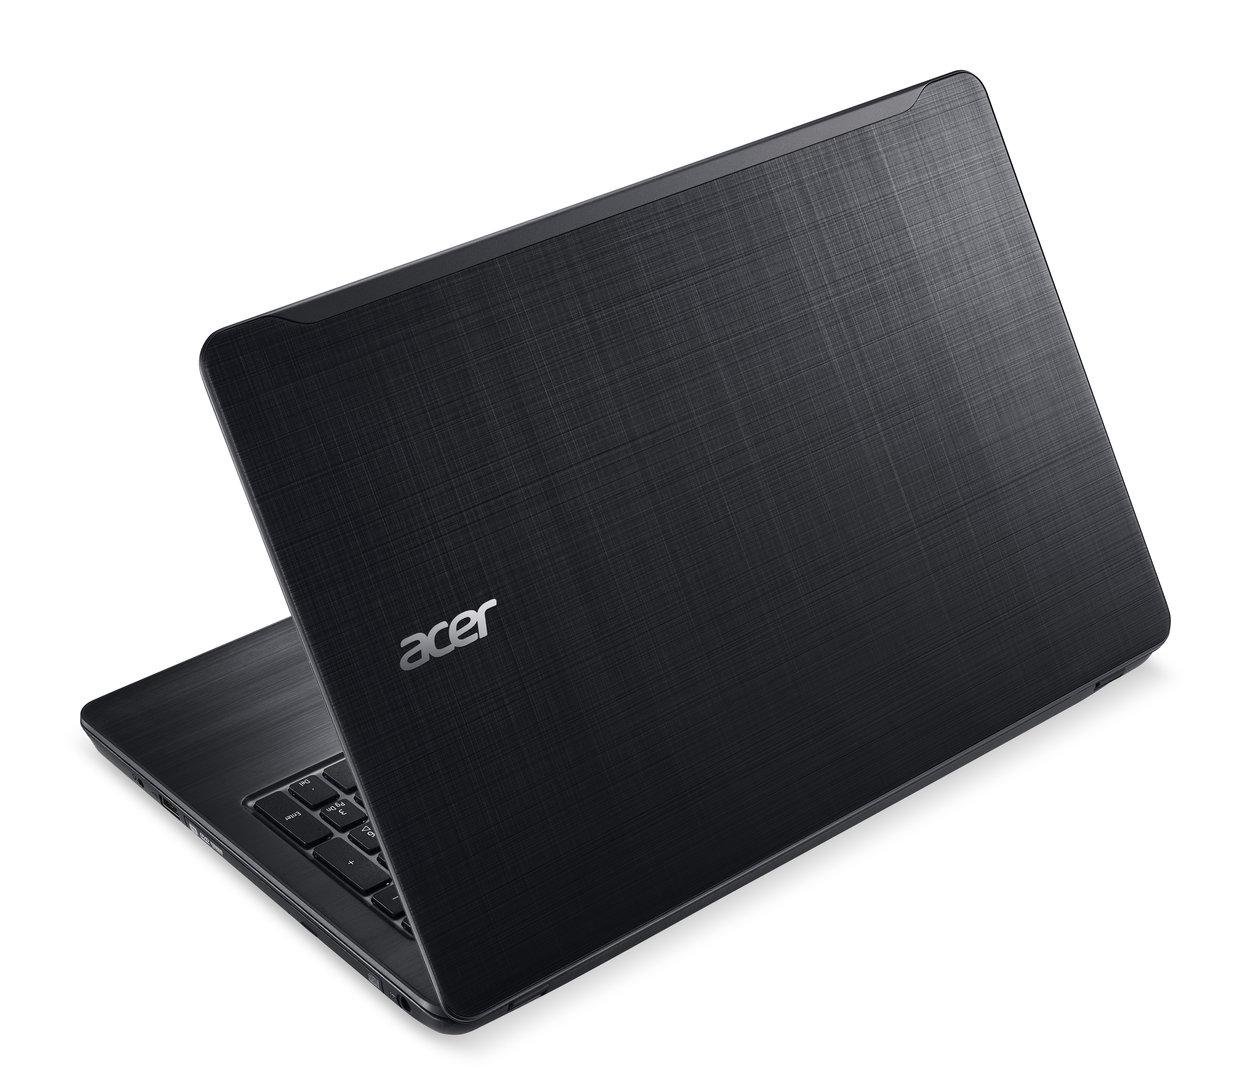 Acer Aspire F 15 Obsidian Black